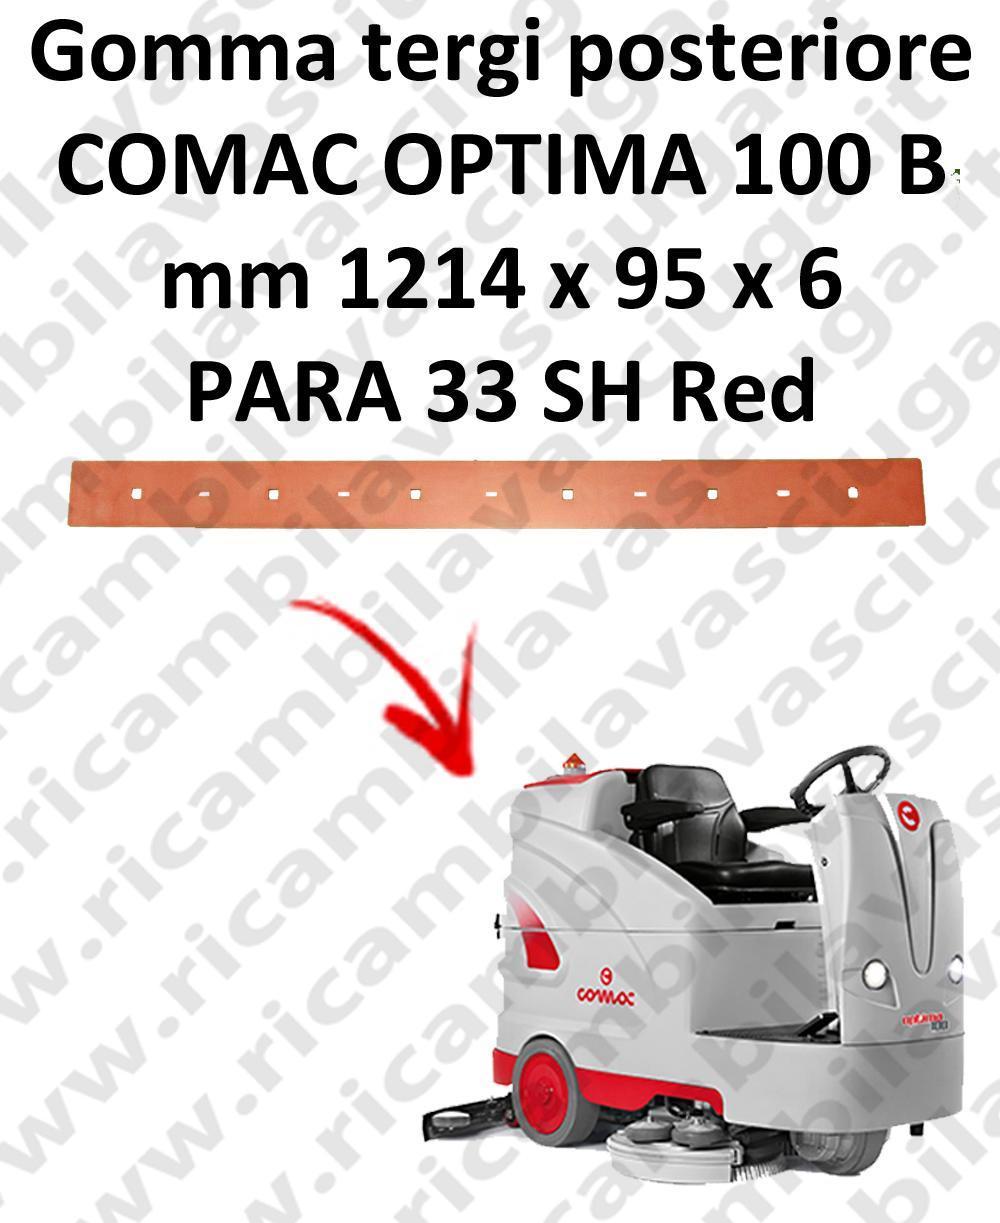 OPTIMA 100B goma de secado trasero para escobilla de goma COMAC